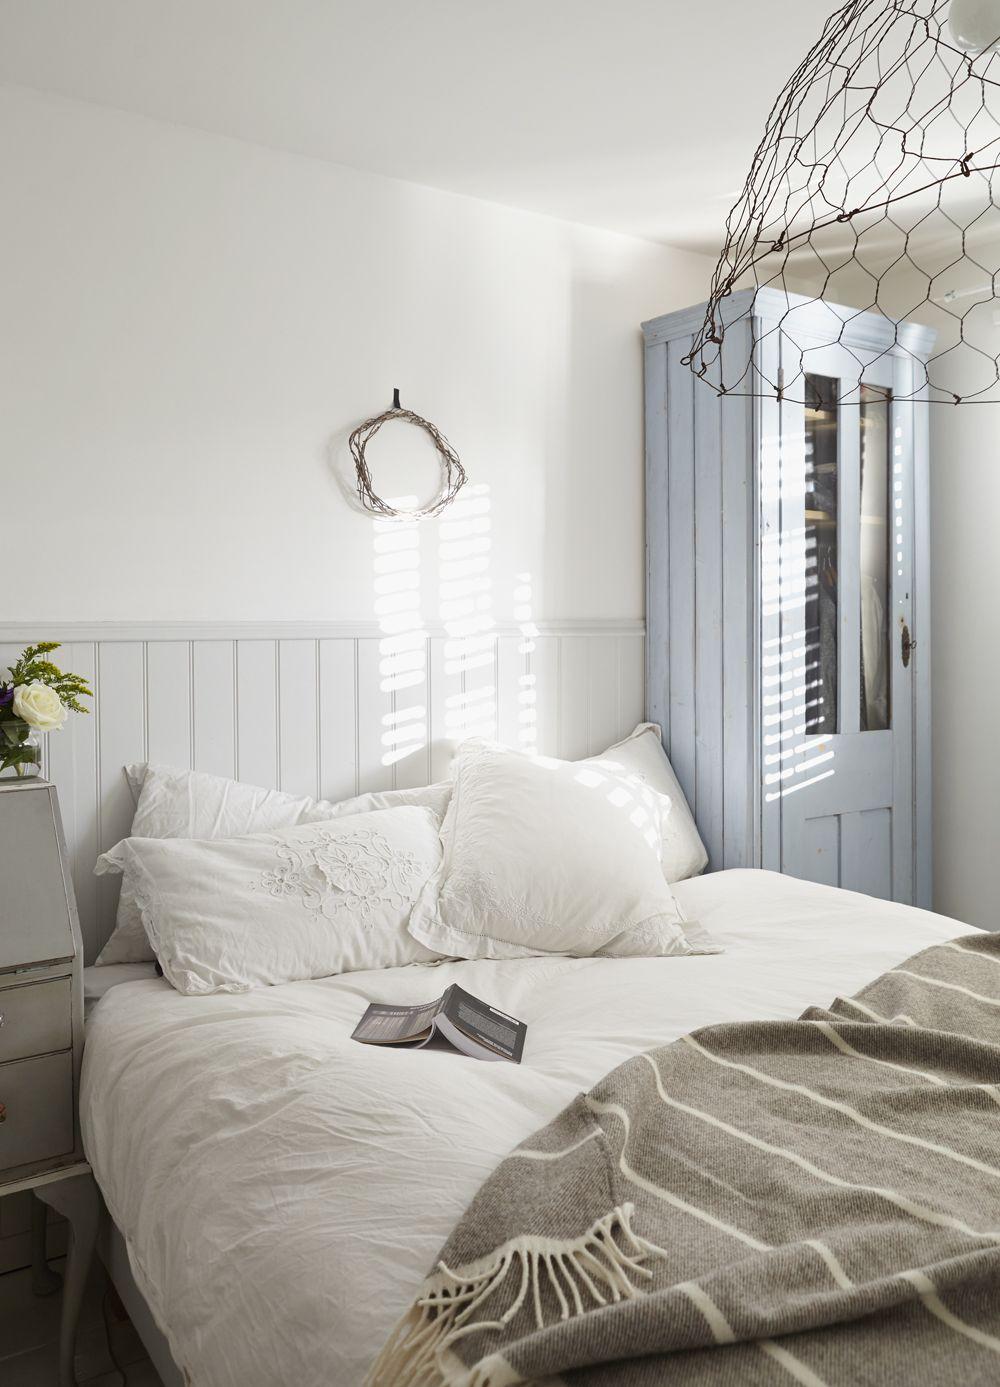 The Home of Artist Caroline Yates Presented by Stylist Hannah Bullivant - Bliss